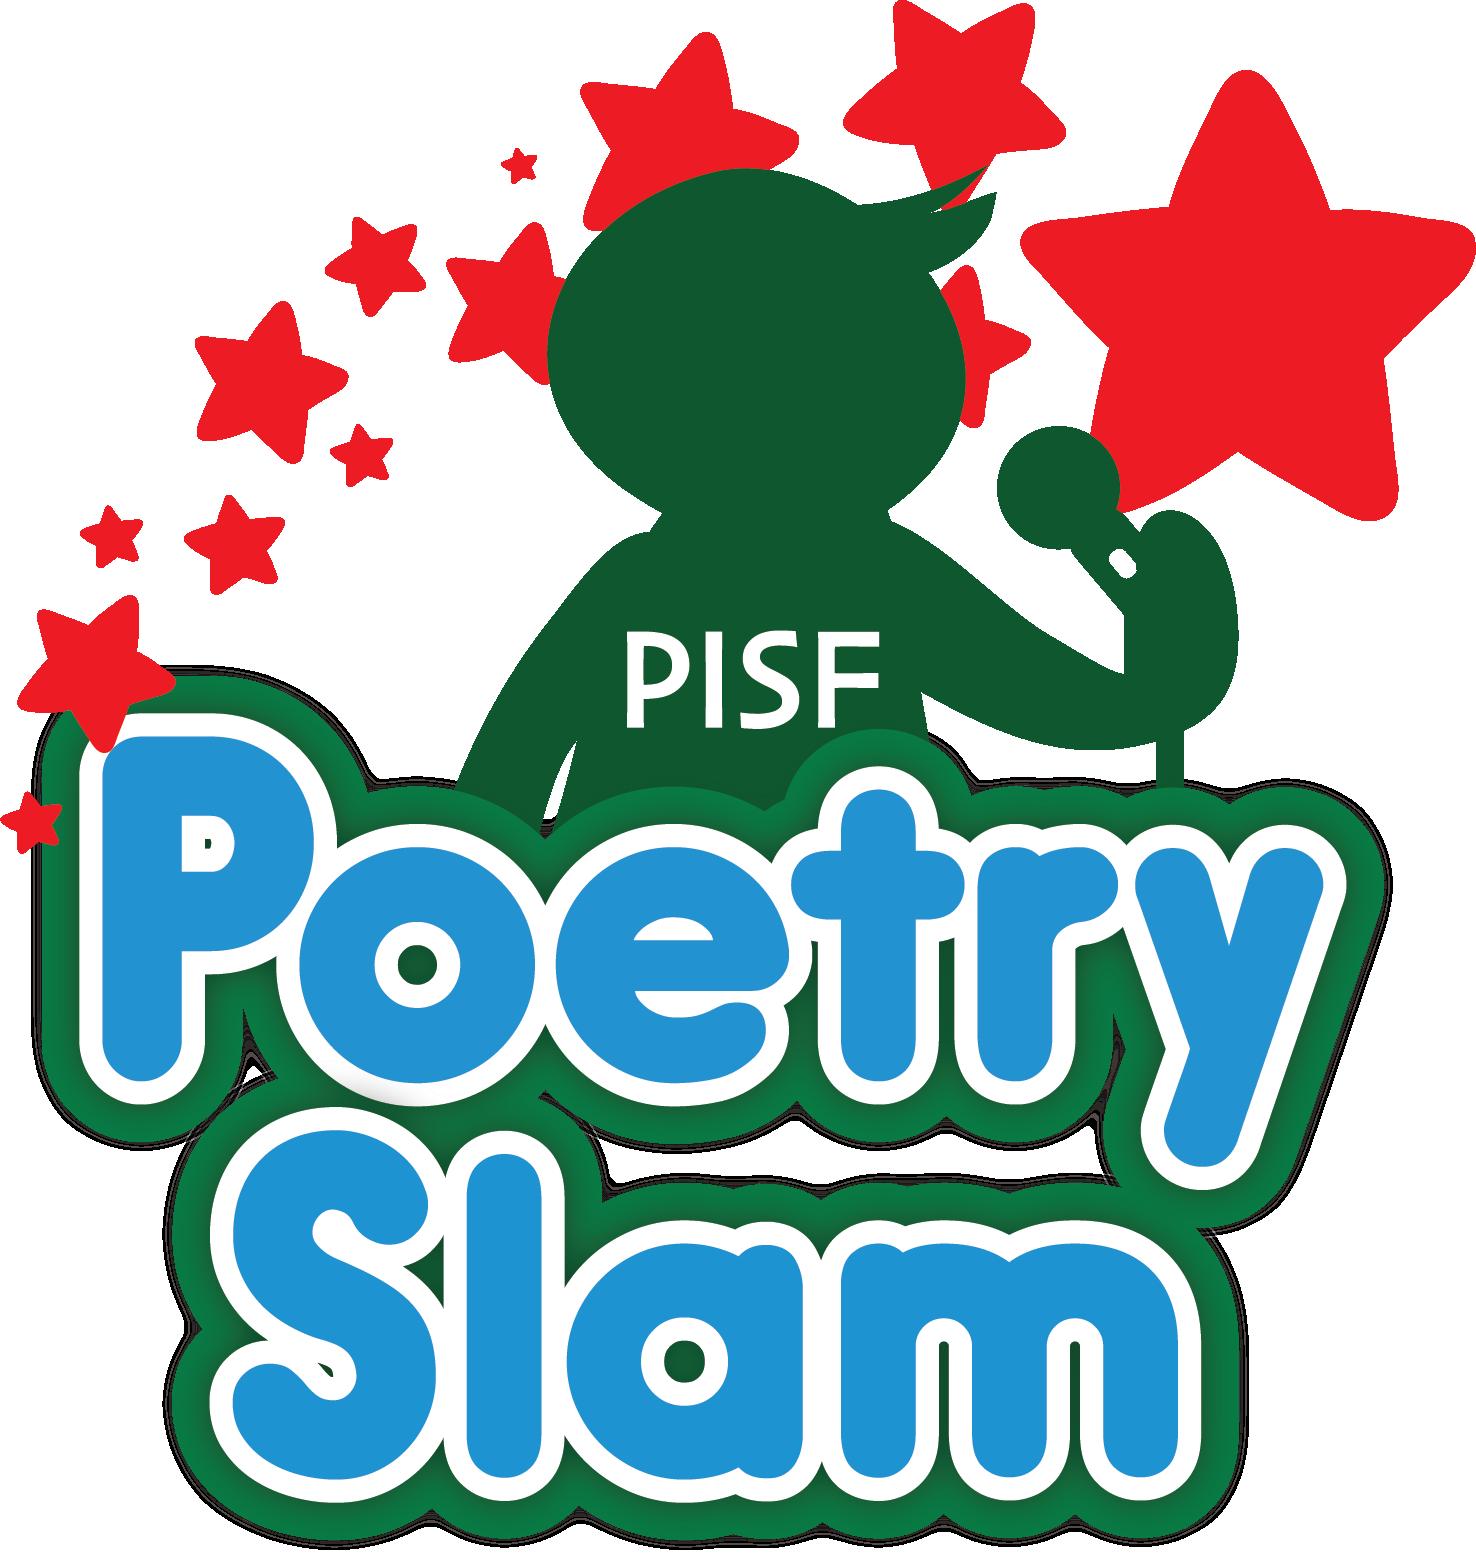 Pisf private international school. Poetry clipart slam poetry